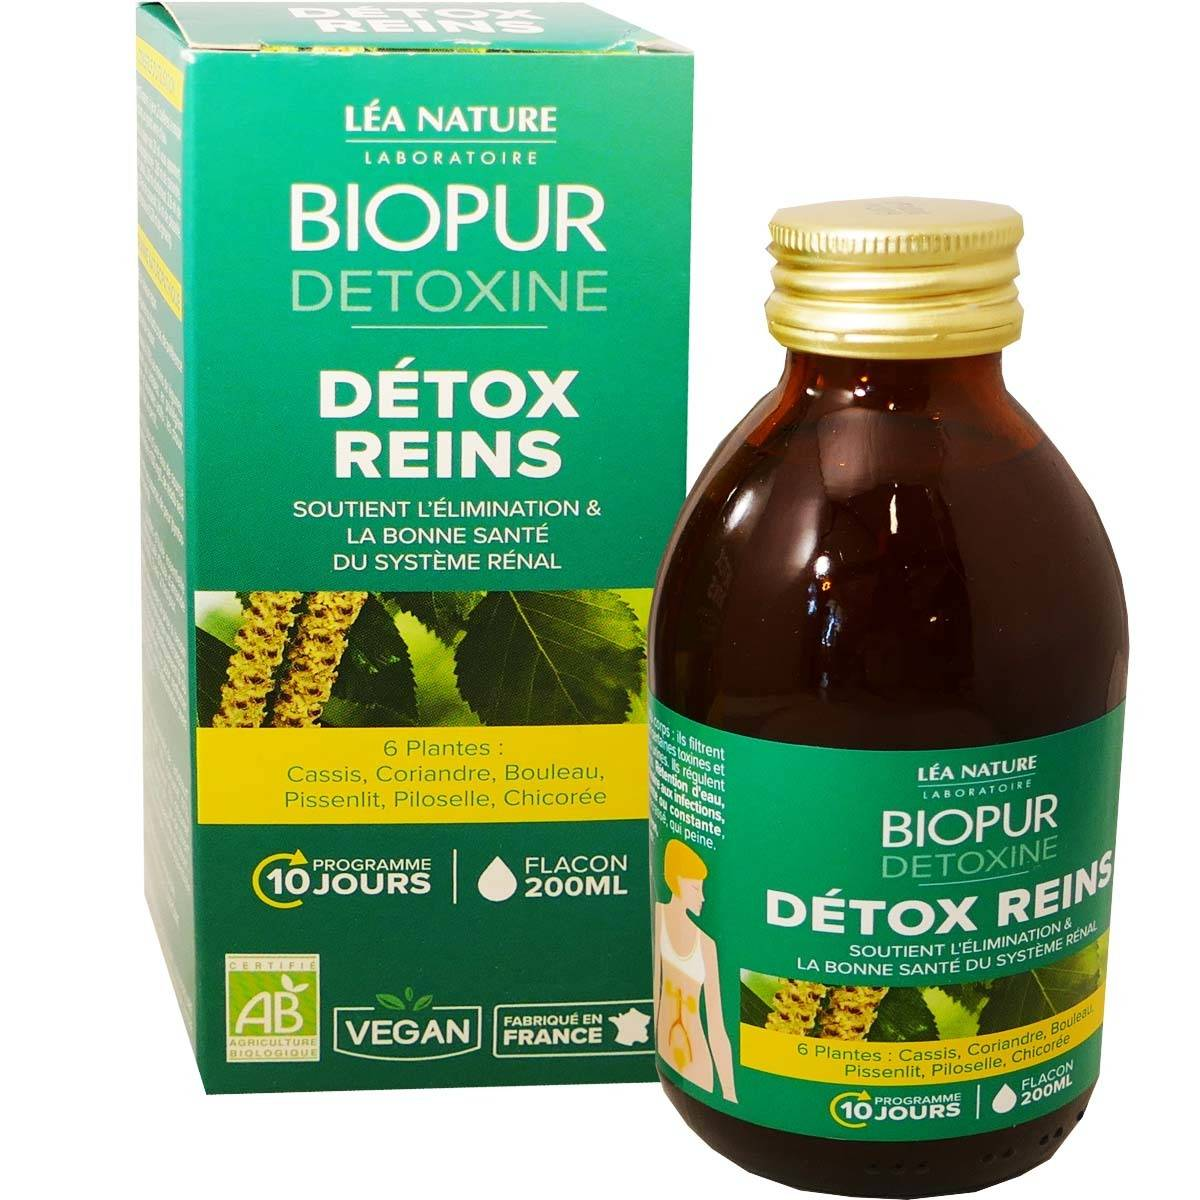 Lea nature biopur detoxine reins bio 200 ml